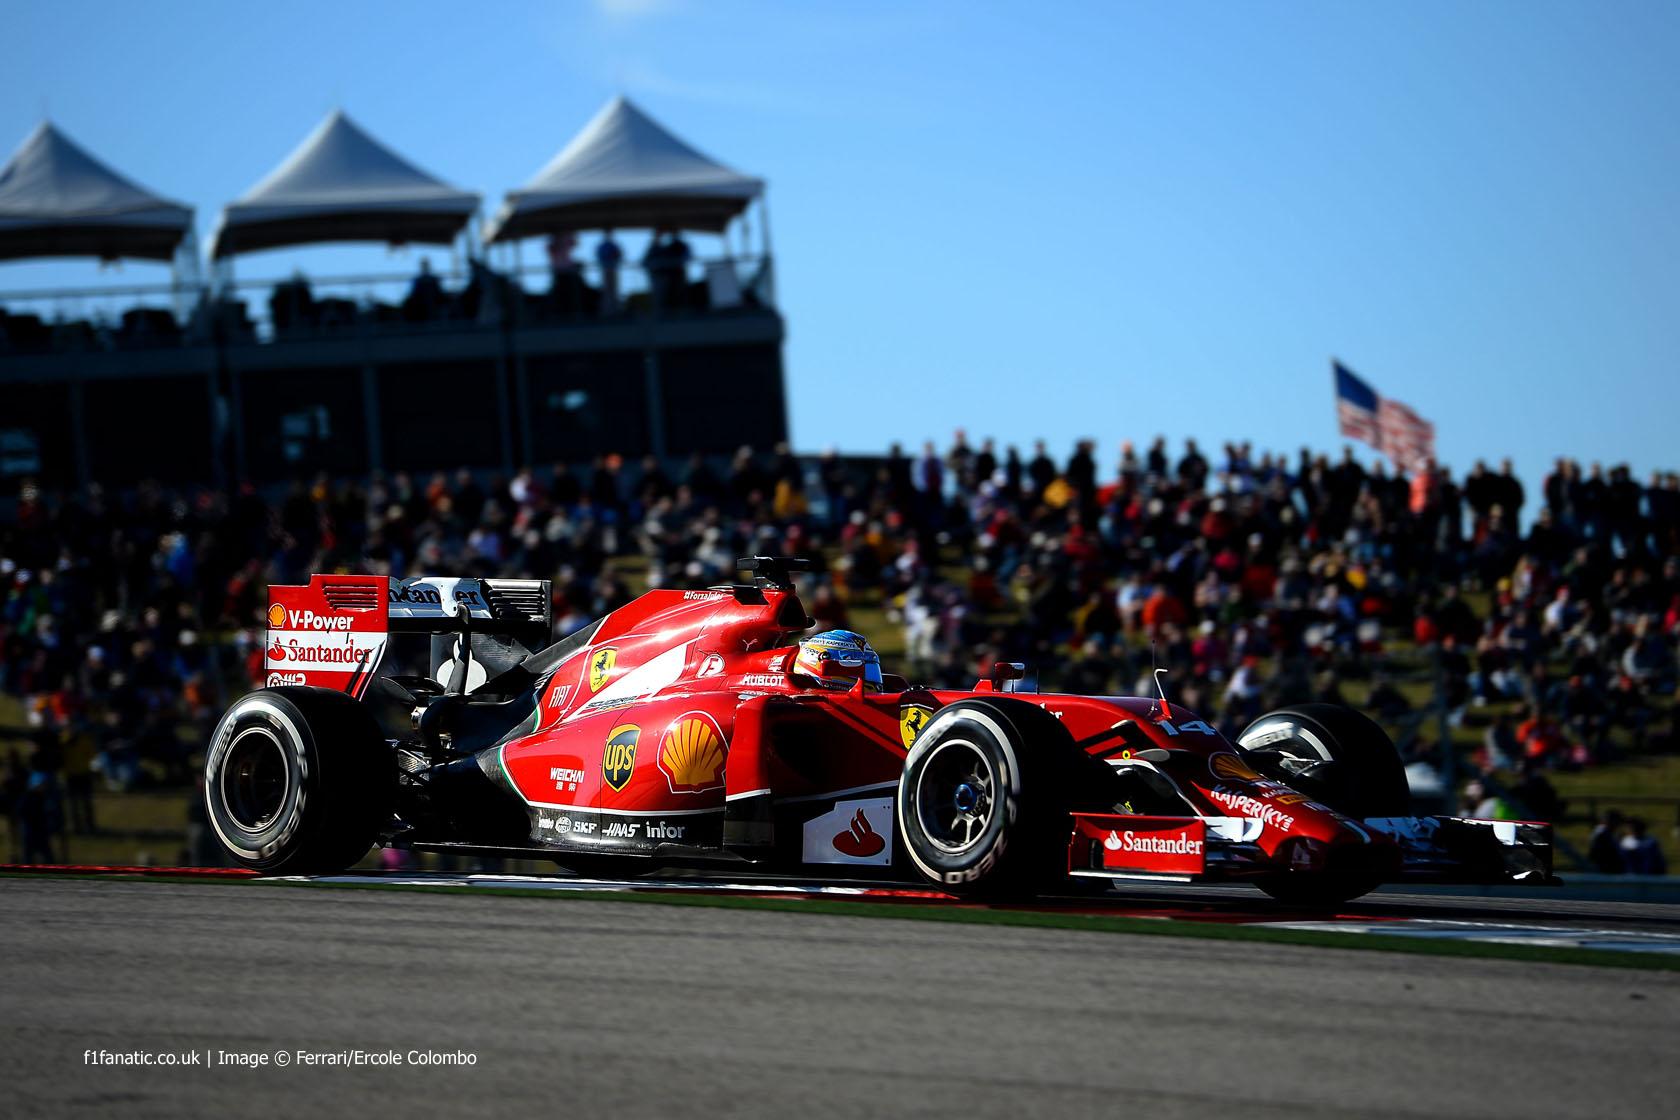 Fernando Alonso, Ferrari, Circuit of the Americas, 2014